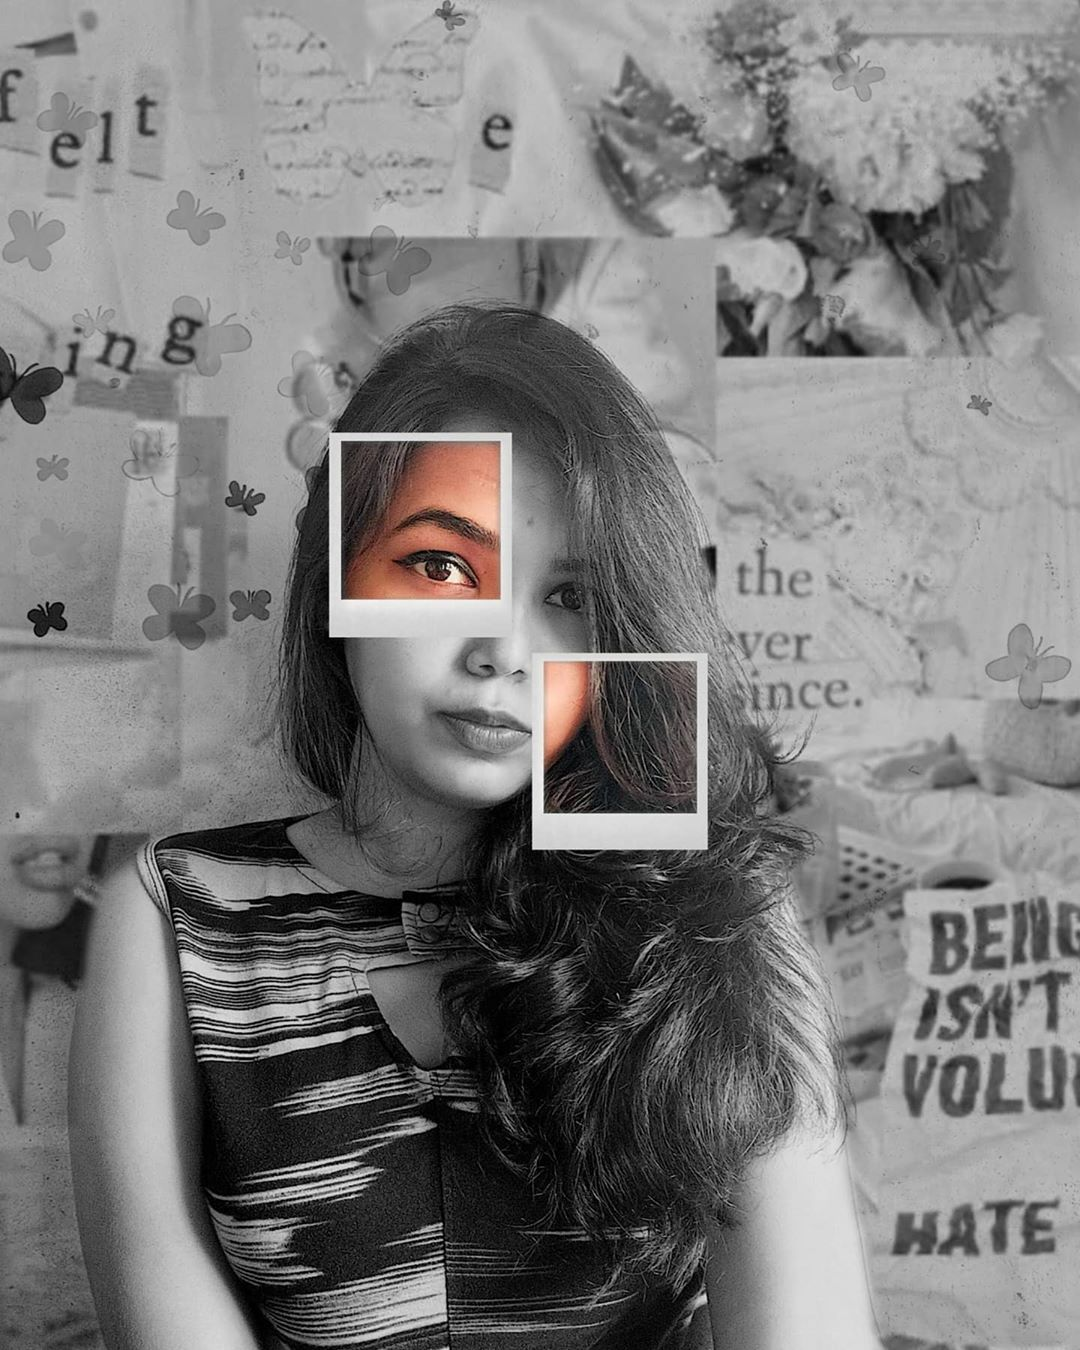 Dare to be real, it's rare💜 . . . 📸 - redmi note 8 pro @redmiindia . . . . #selfportrait #selfportraits #selfportraitphotography #portraiture #photooftheday #picsart #picsartedit #picsarttutorial #picsartedits #picsartediting #explore #aesthetic #aesthetics #aestheticedits #aestheticbackground #advancedselfie #instagood #instagram #mobilephotography #creativephotography #insta #howtopose #aesthetic #selfphotography #creativeportraits #contentcreator #bornoninstagram #blackandwhite #retro #mood